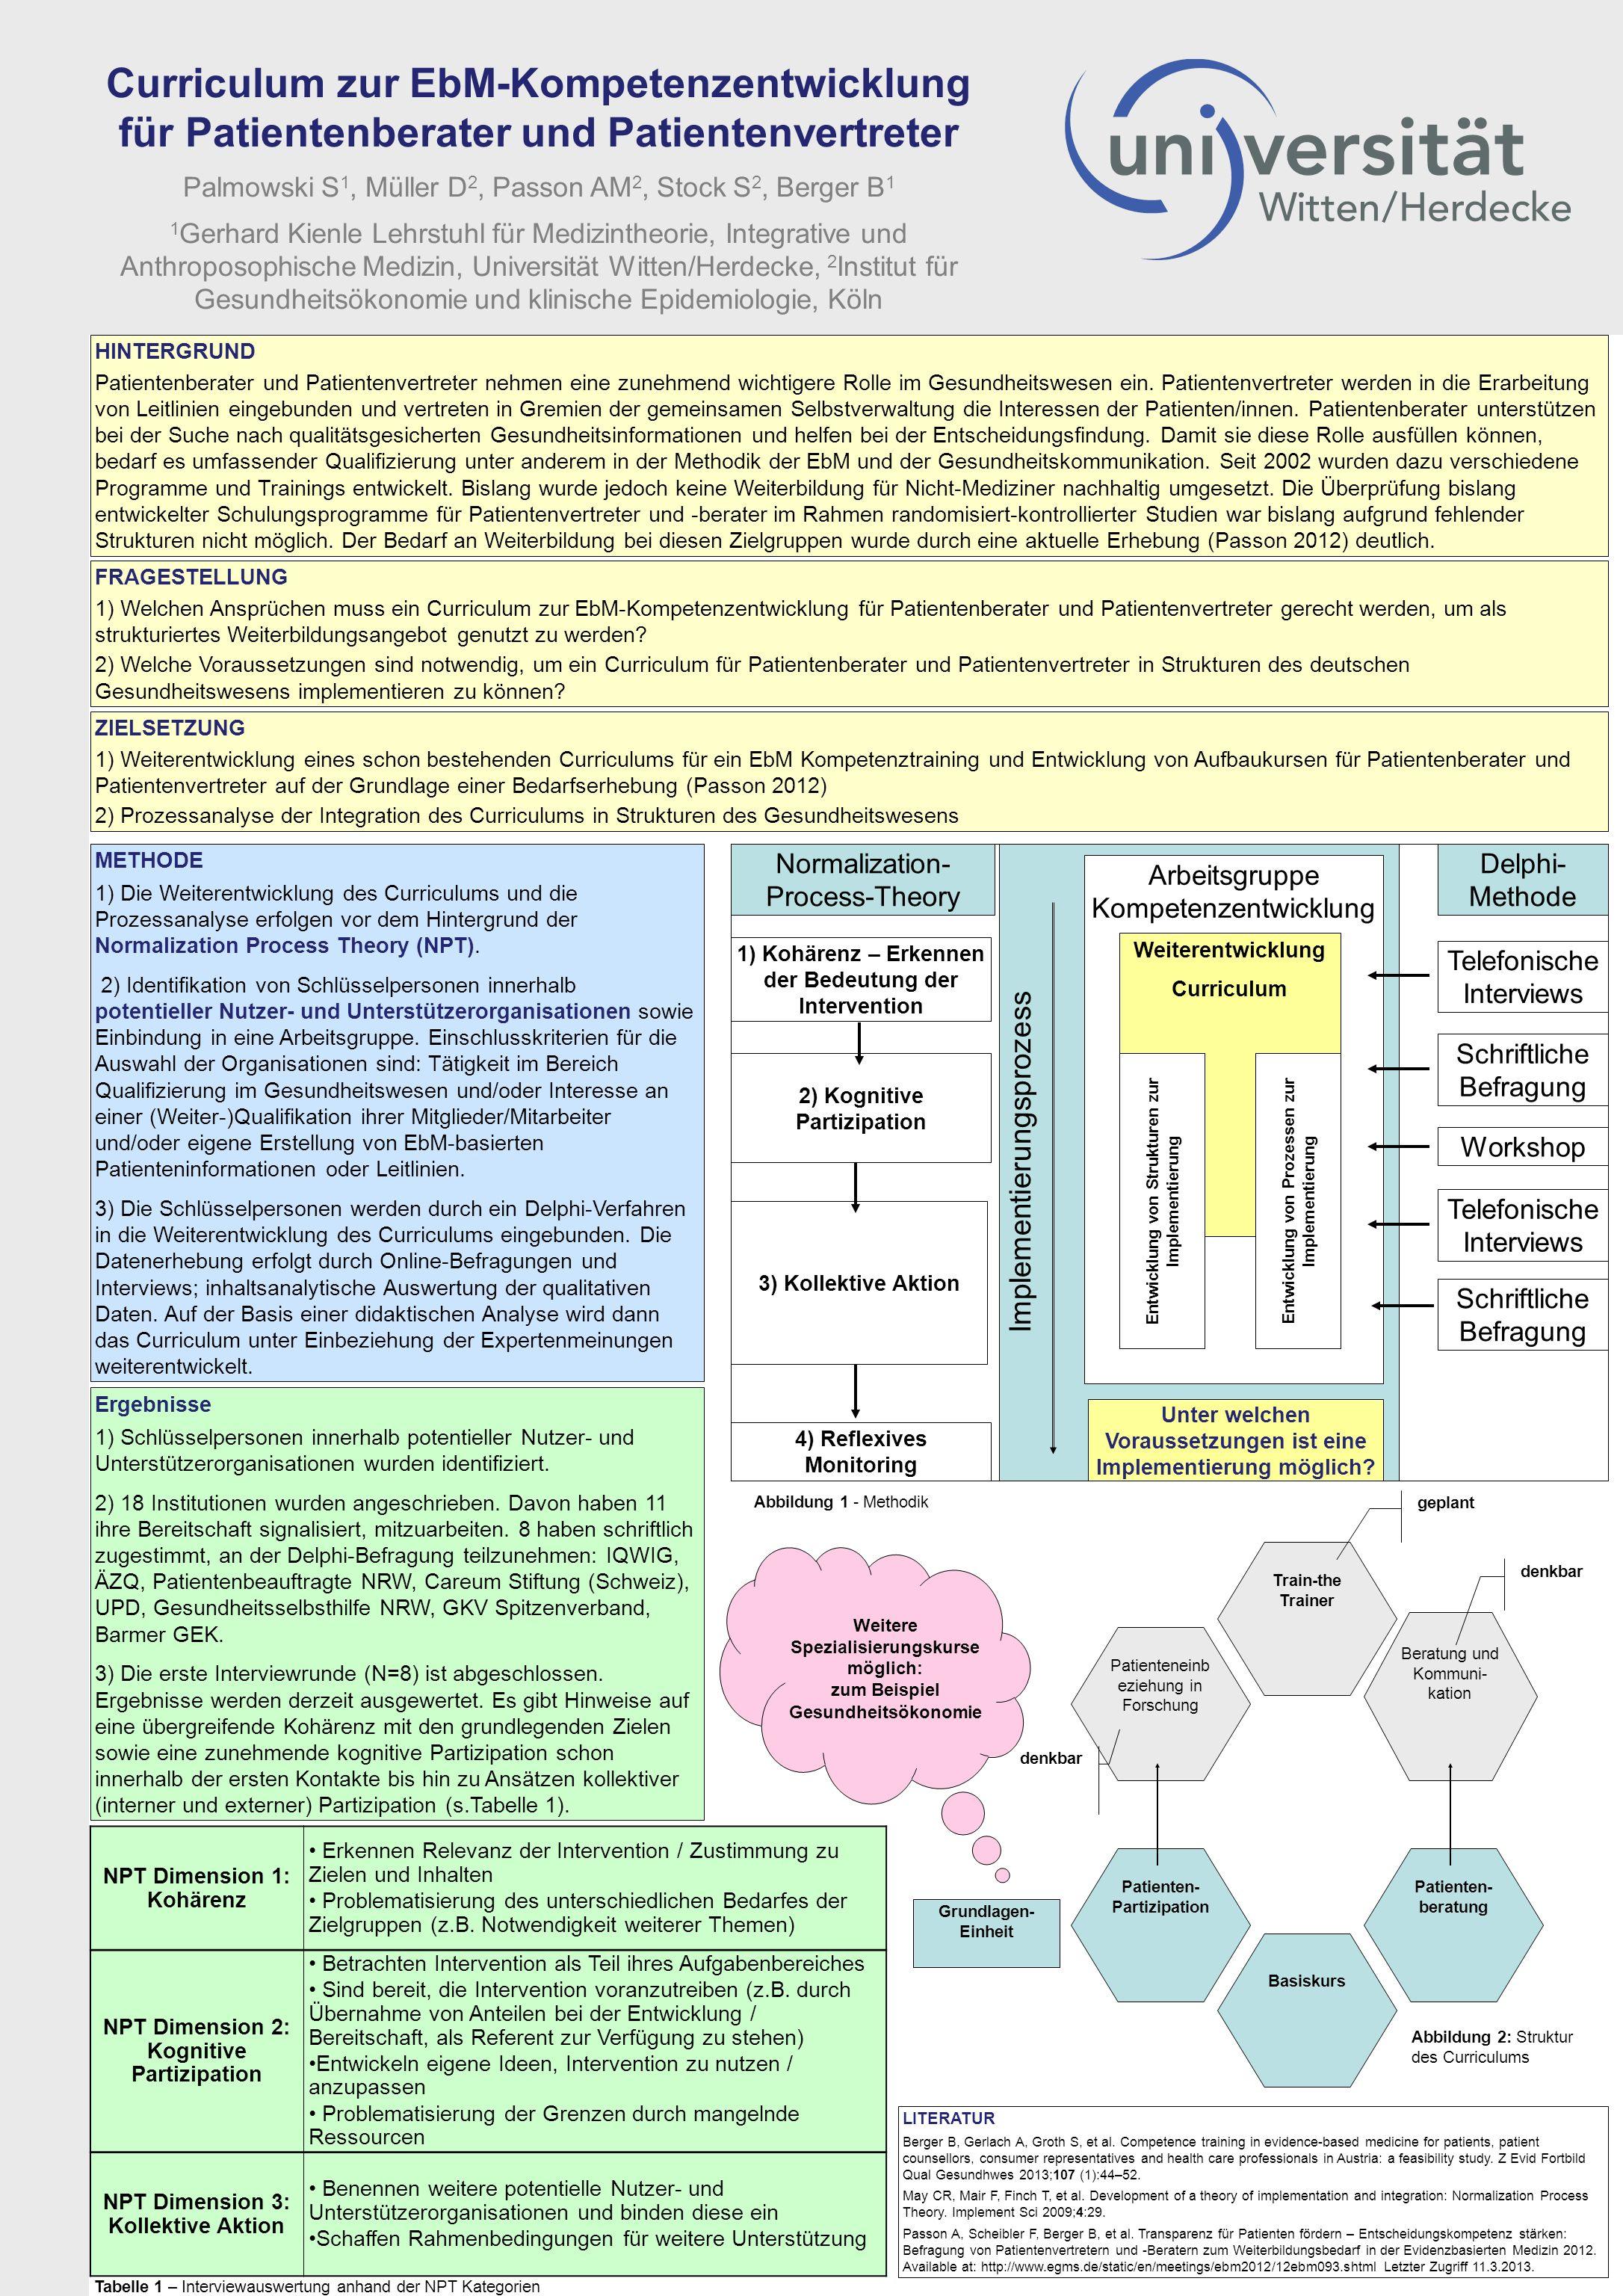 Basiskurs Patienten- beratung Patienten- Partizipation Patienteneinb eziehung in Forschung Beratung und Kommuni- kation Train-the Trainer denkbar gepl